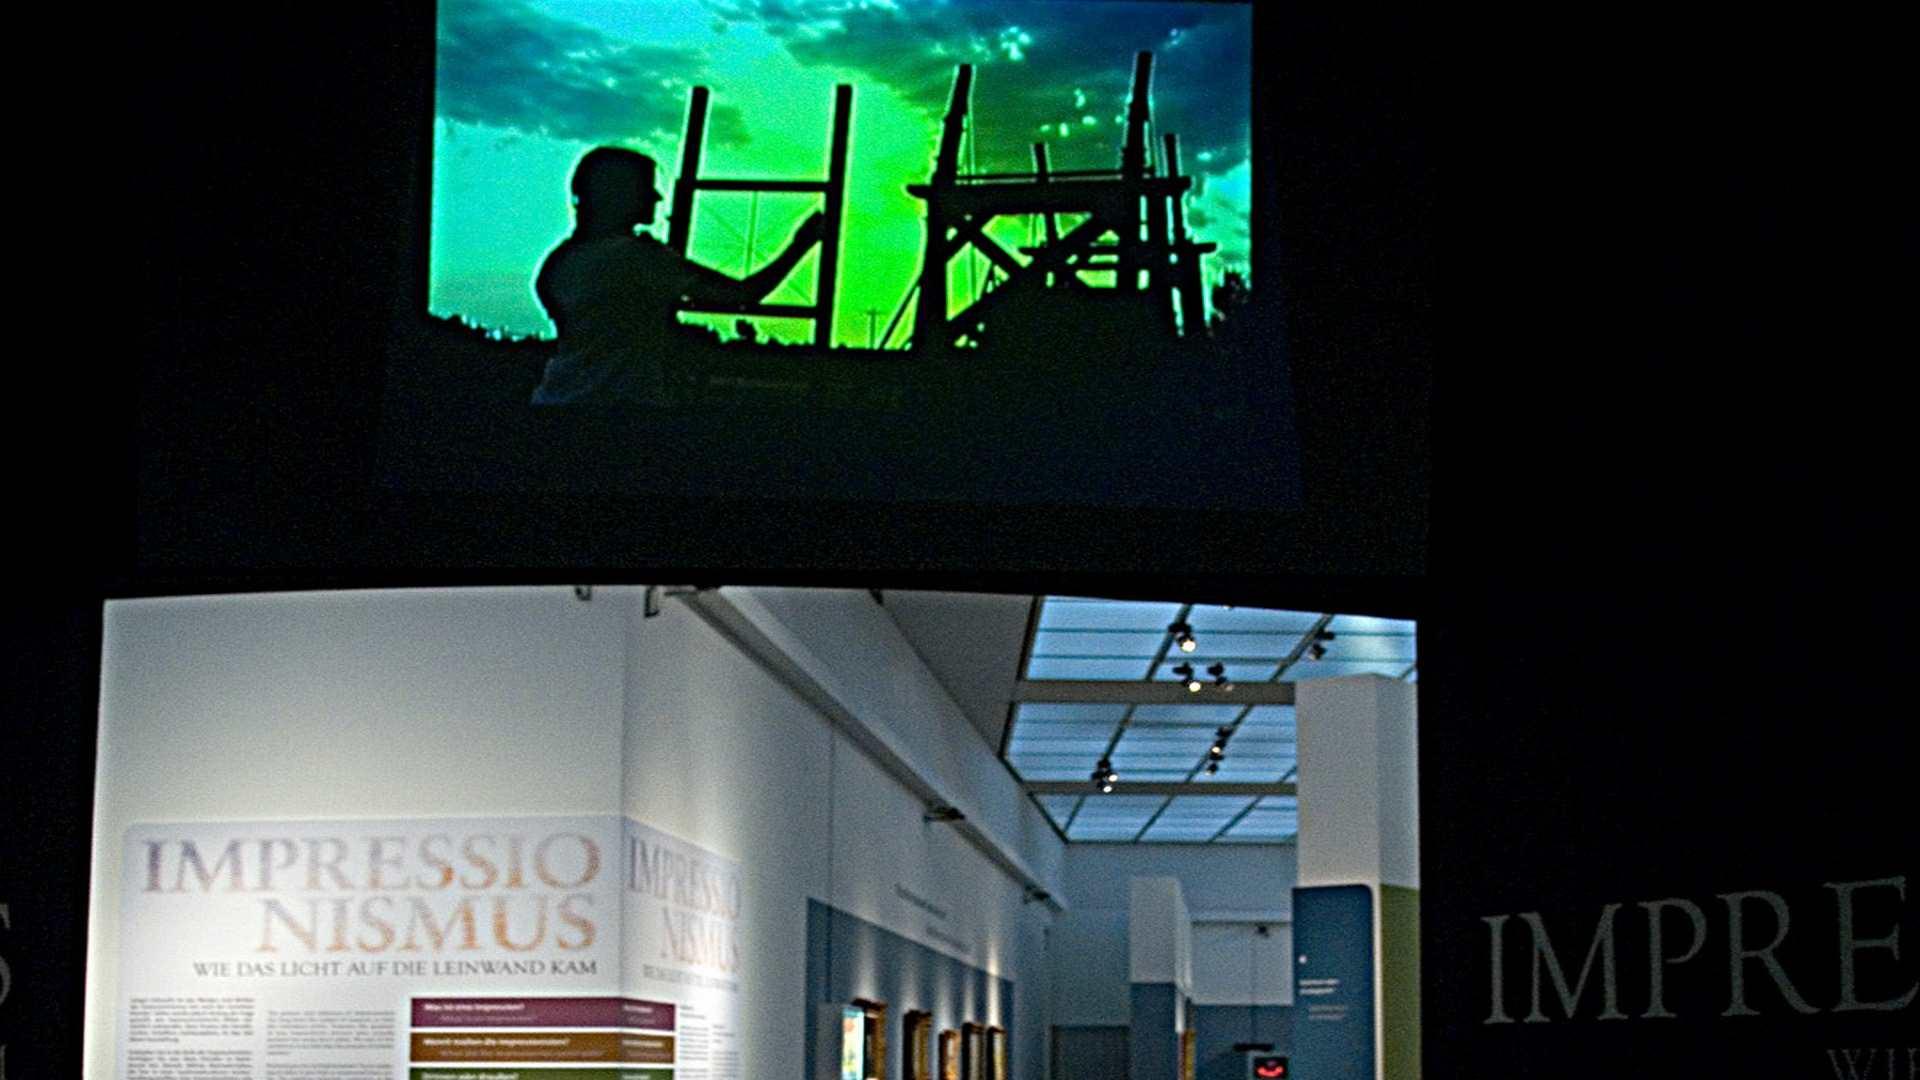 ref 16 - Museumsfilm